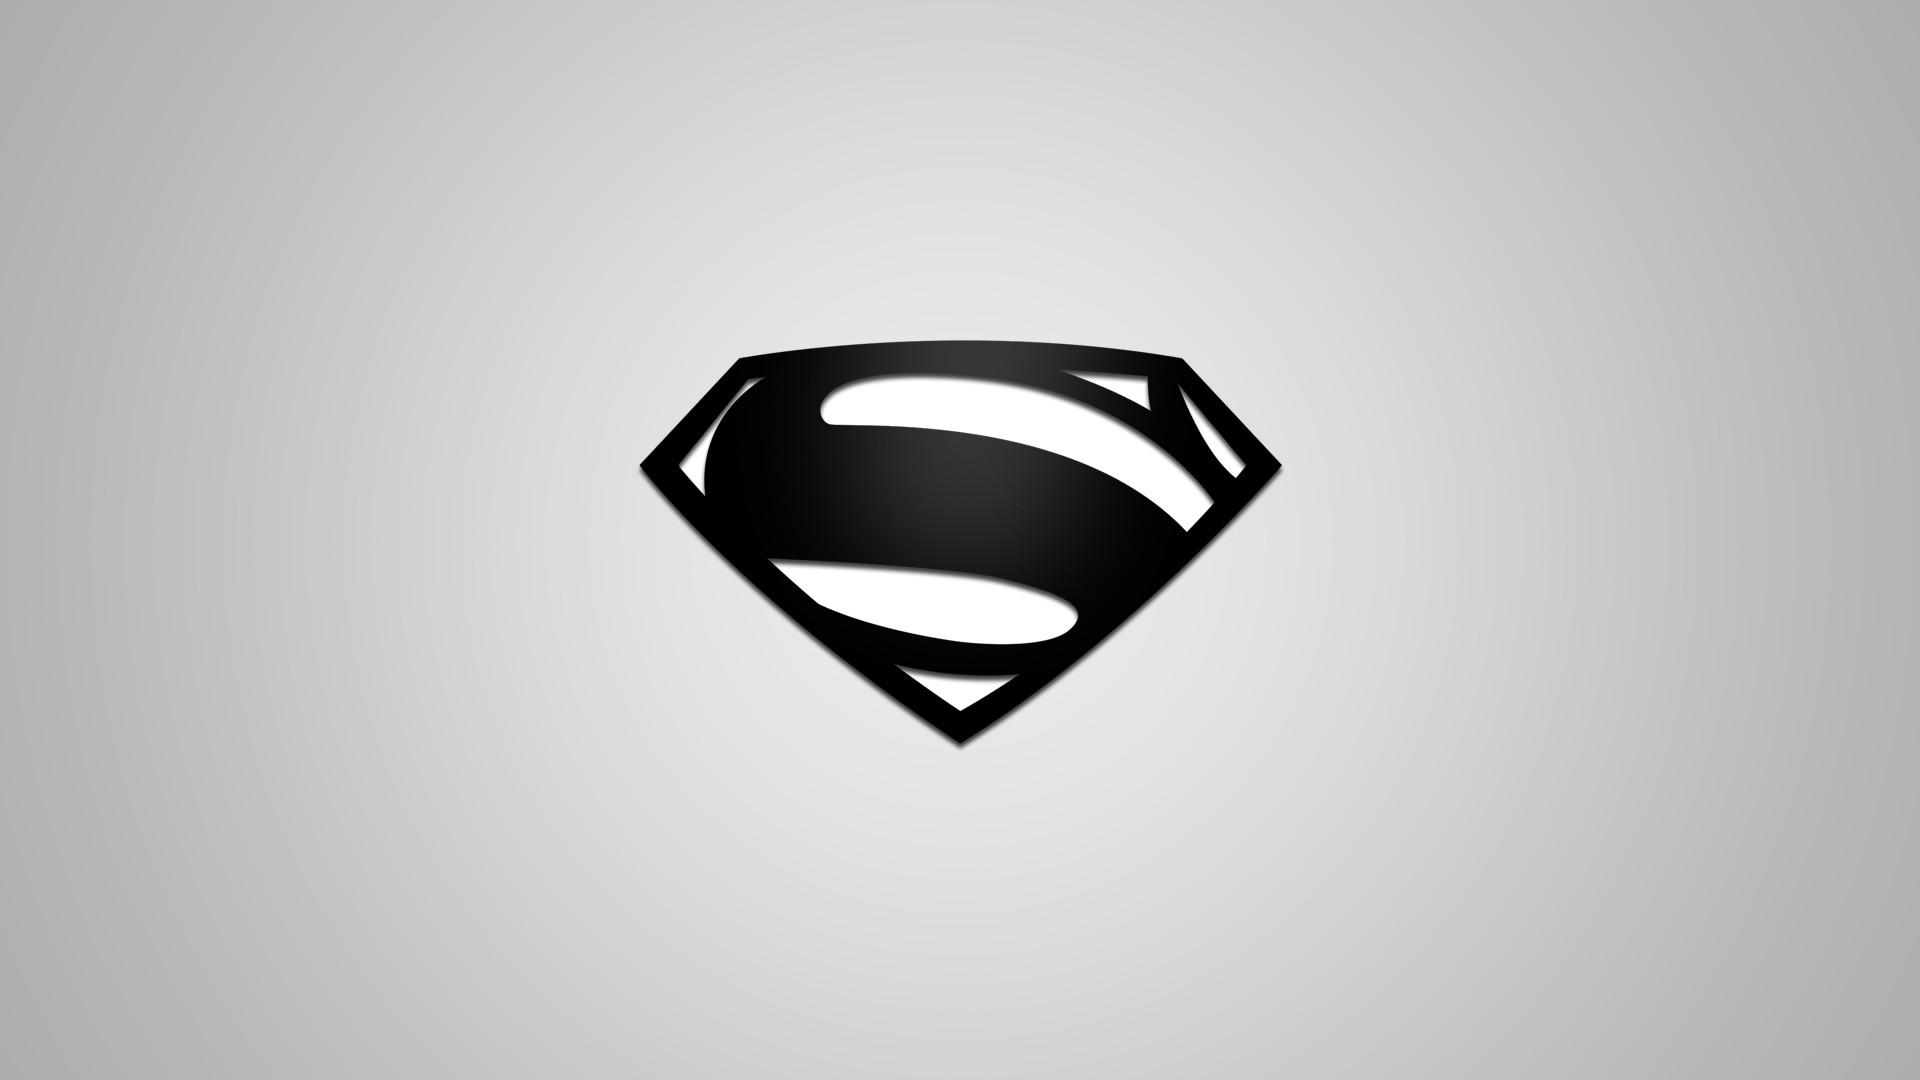 Dark Blue Iphone Wallpaper Superman Logo Hd Wallpapers 1080p 60 Images